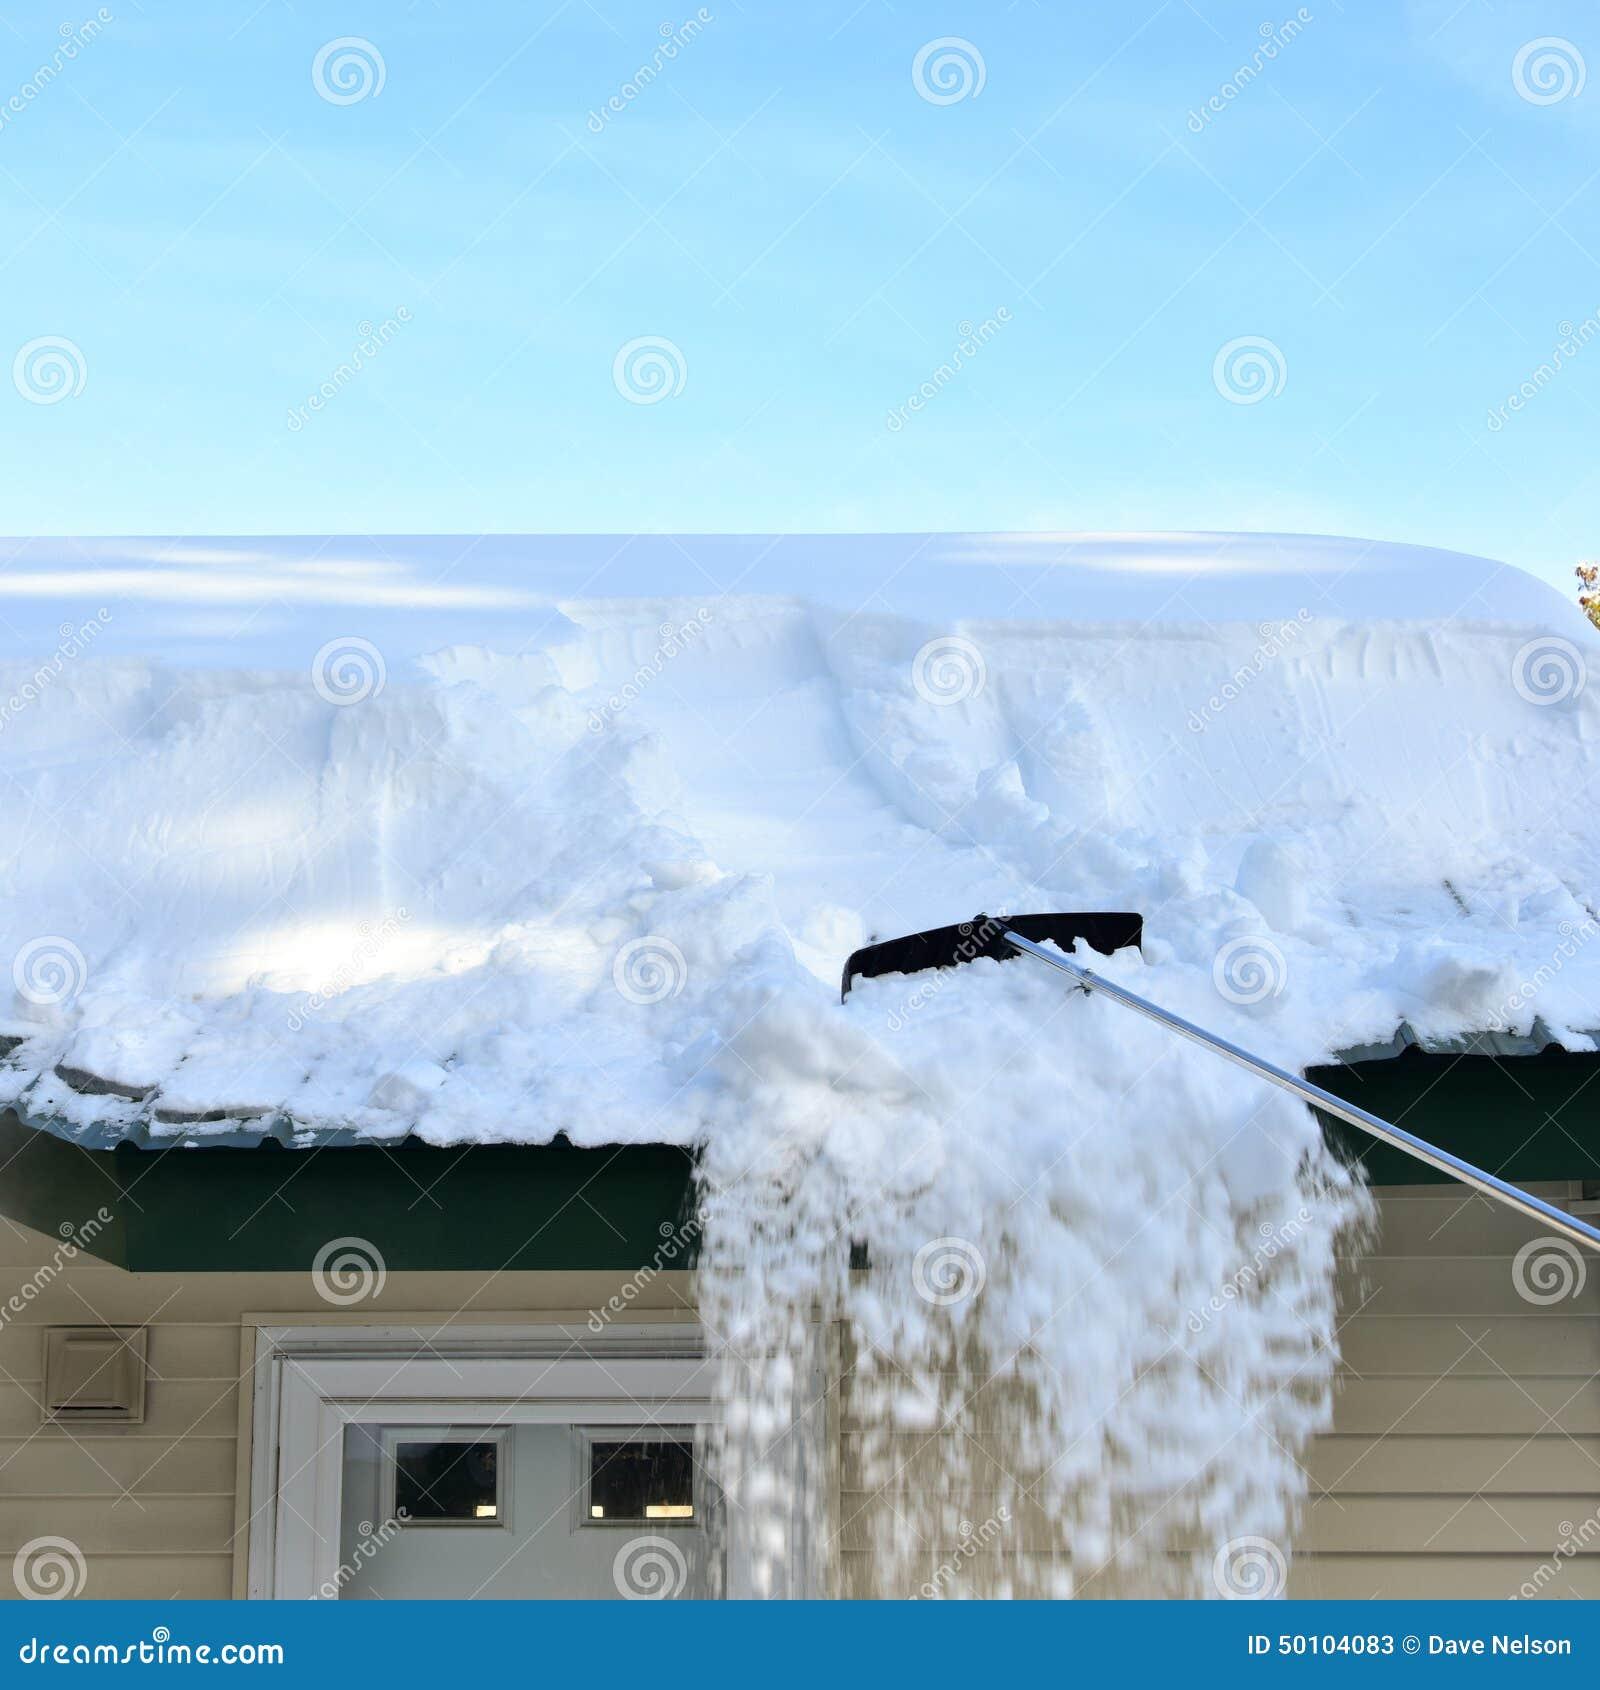 Raking snow from roof